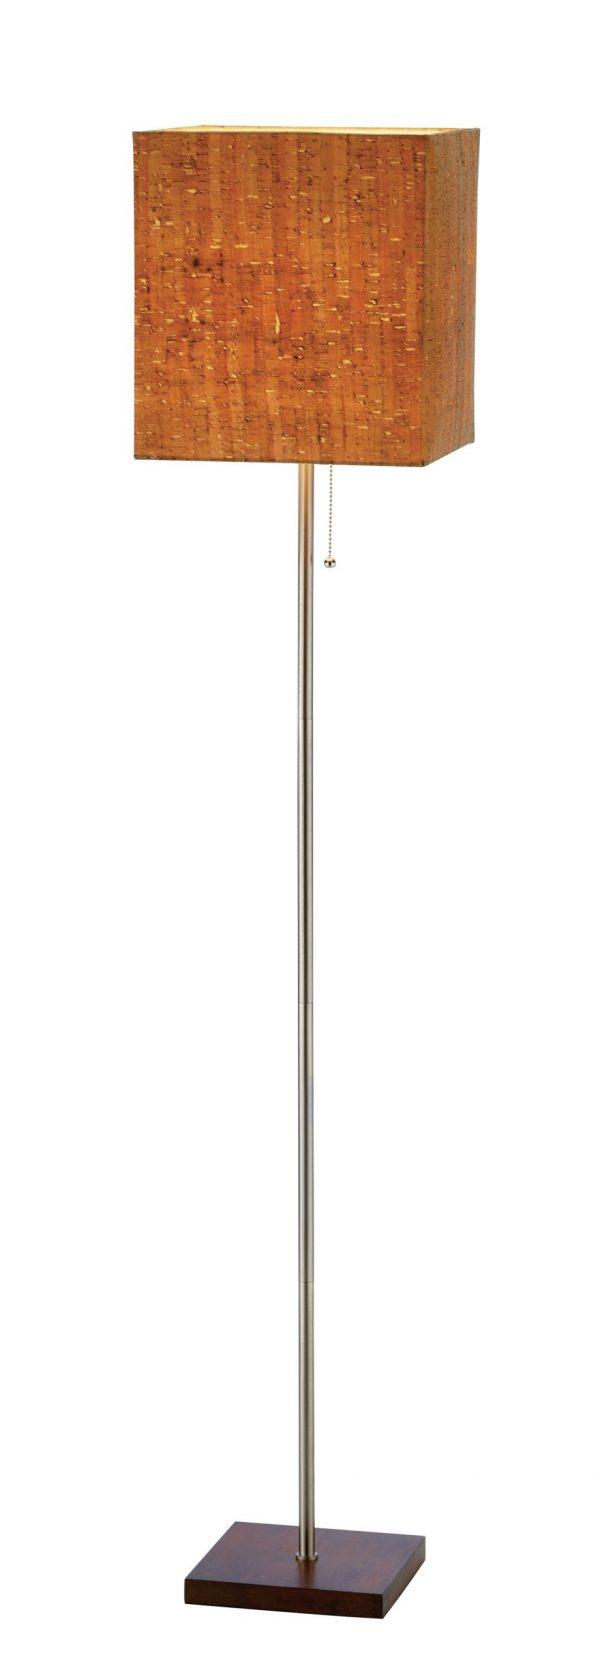 "11"" X 11"" X 56"" Walnut Wood/Metal Floor Lamp"